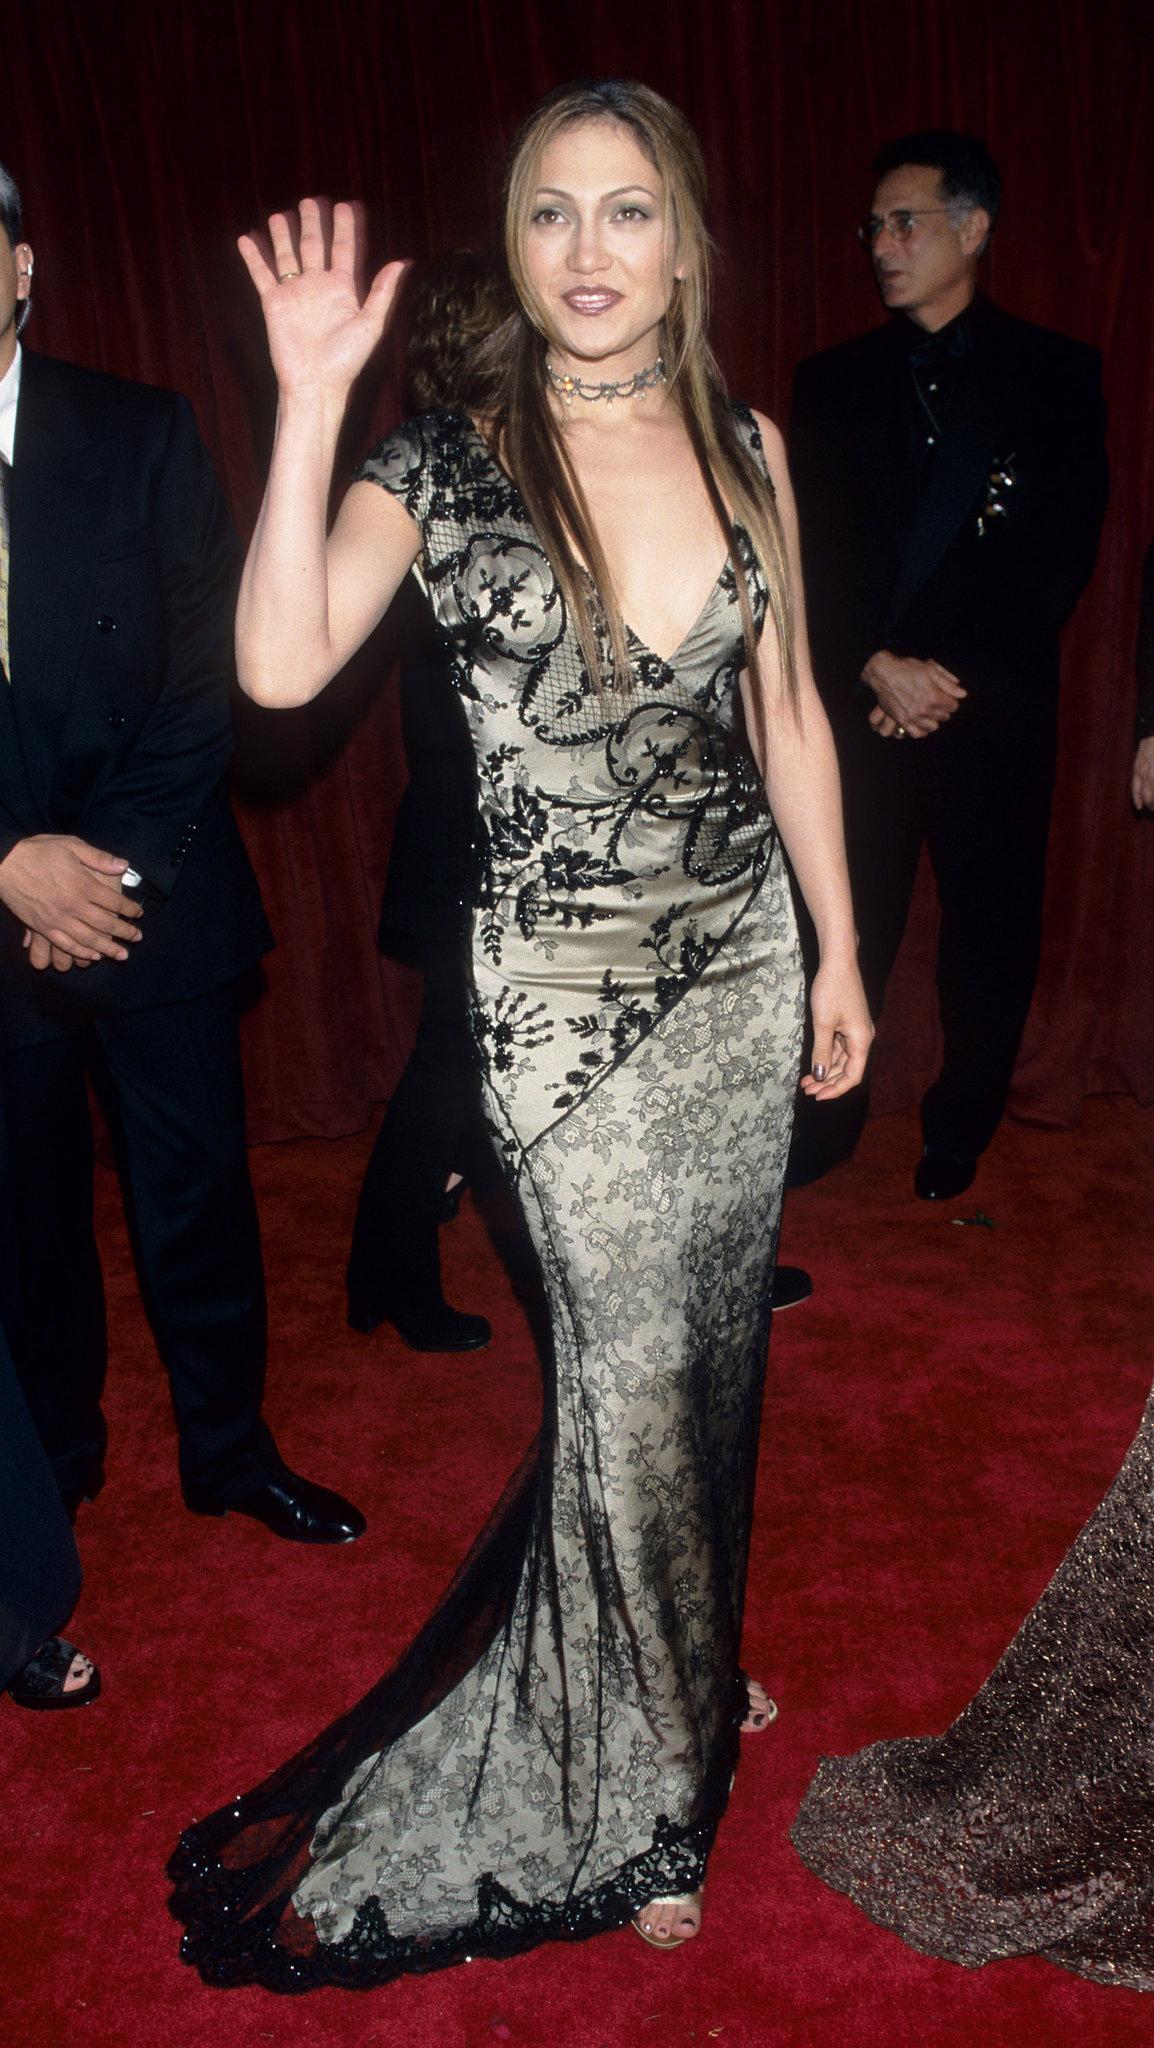 Going vamp on the Oscars red carpet in '98.